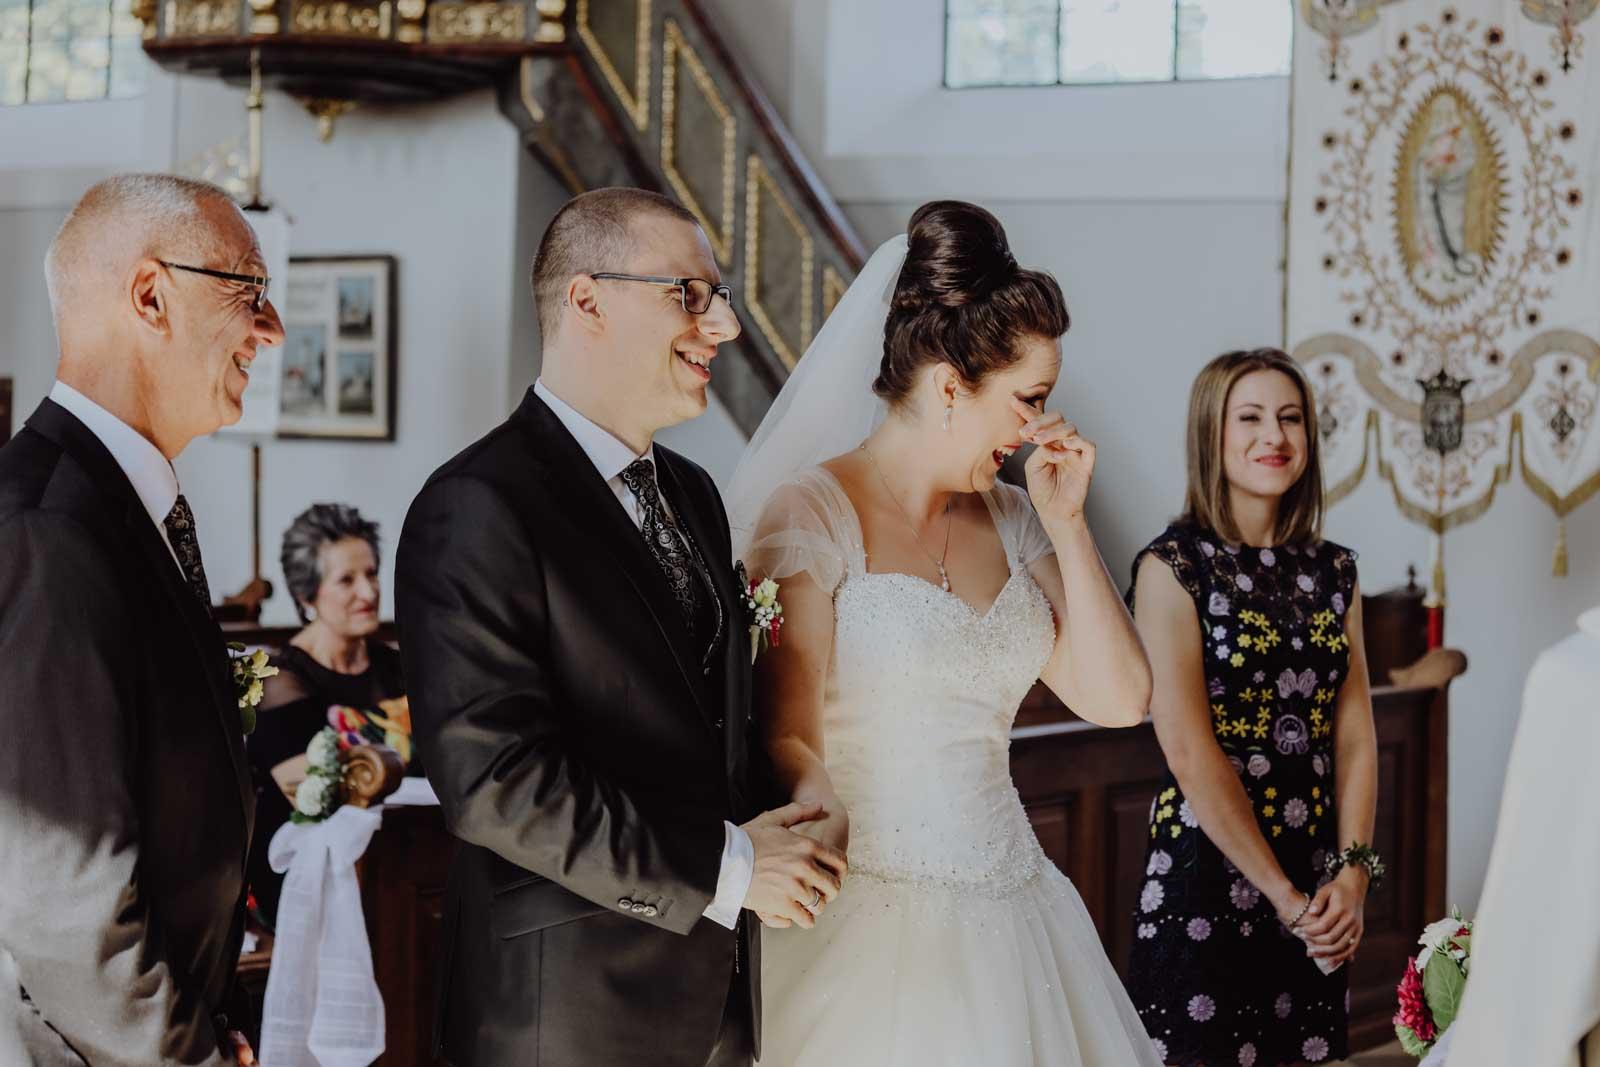 Lachendes Brautpaar am Altar